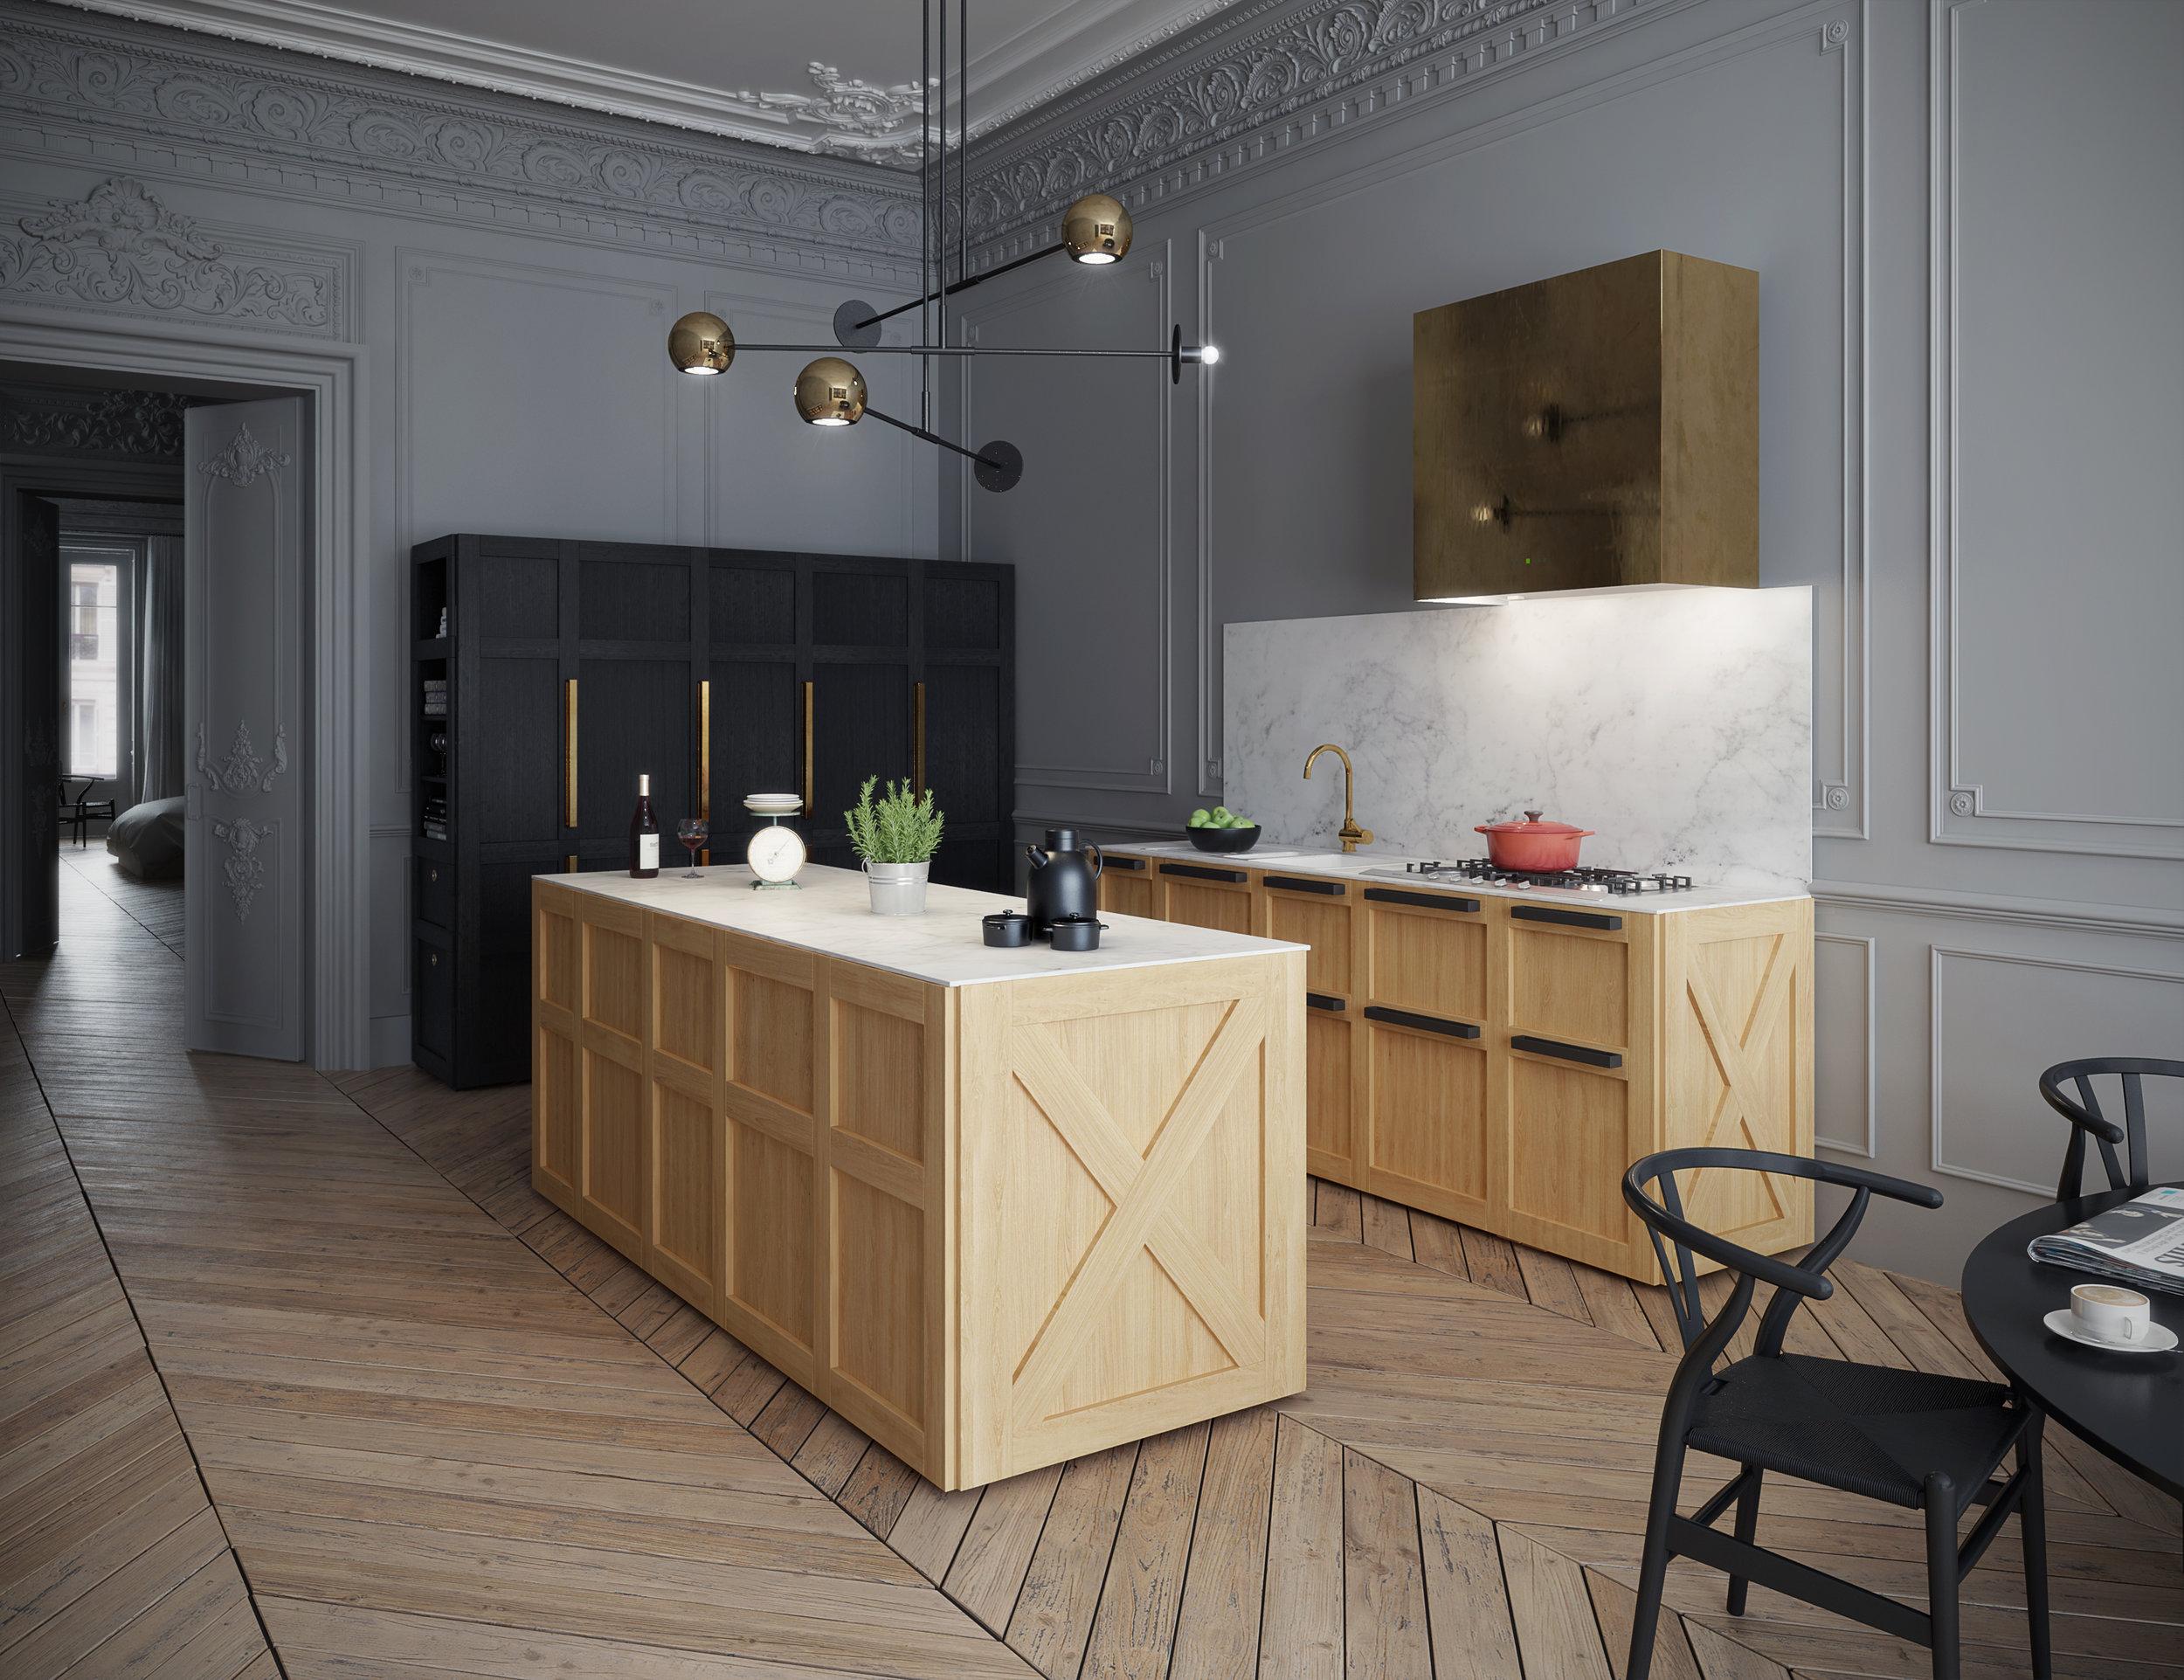 Paris Apartment Interior Design Kitchen Furniture Styling K Box 1.jpg